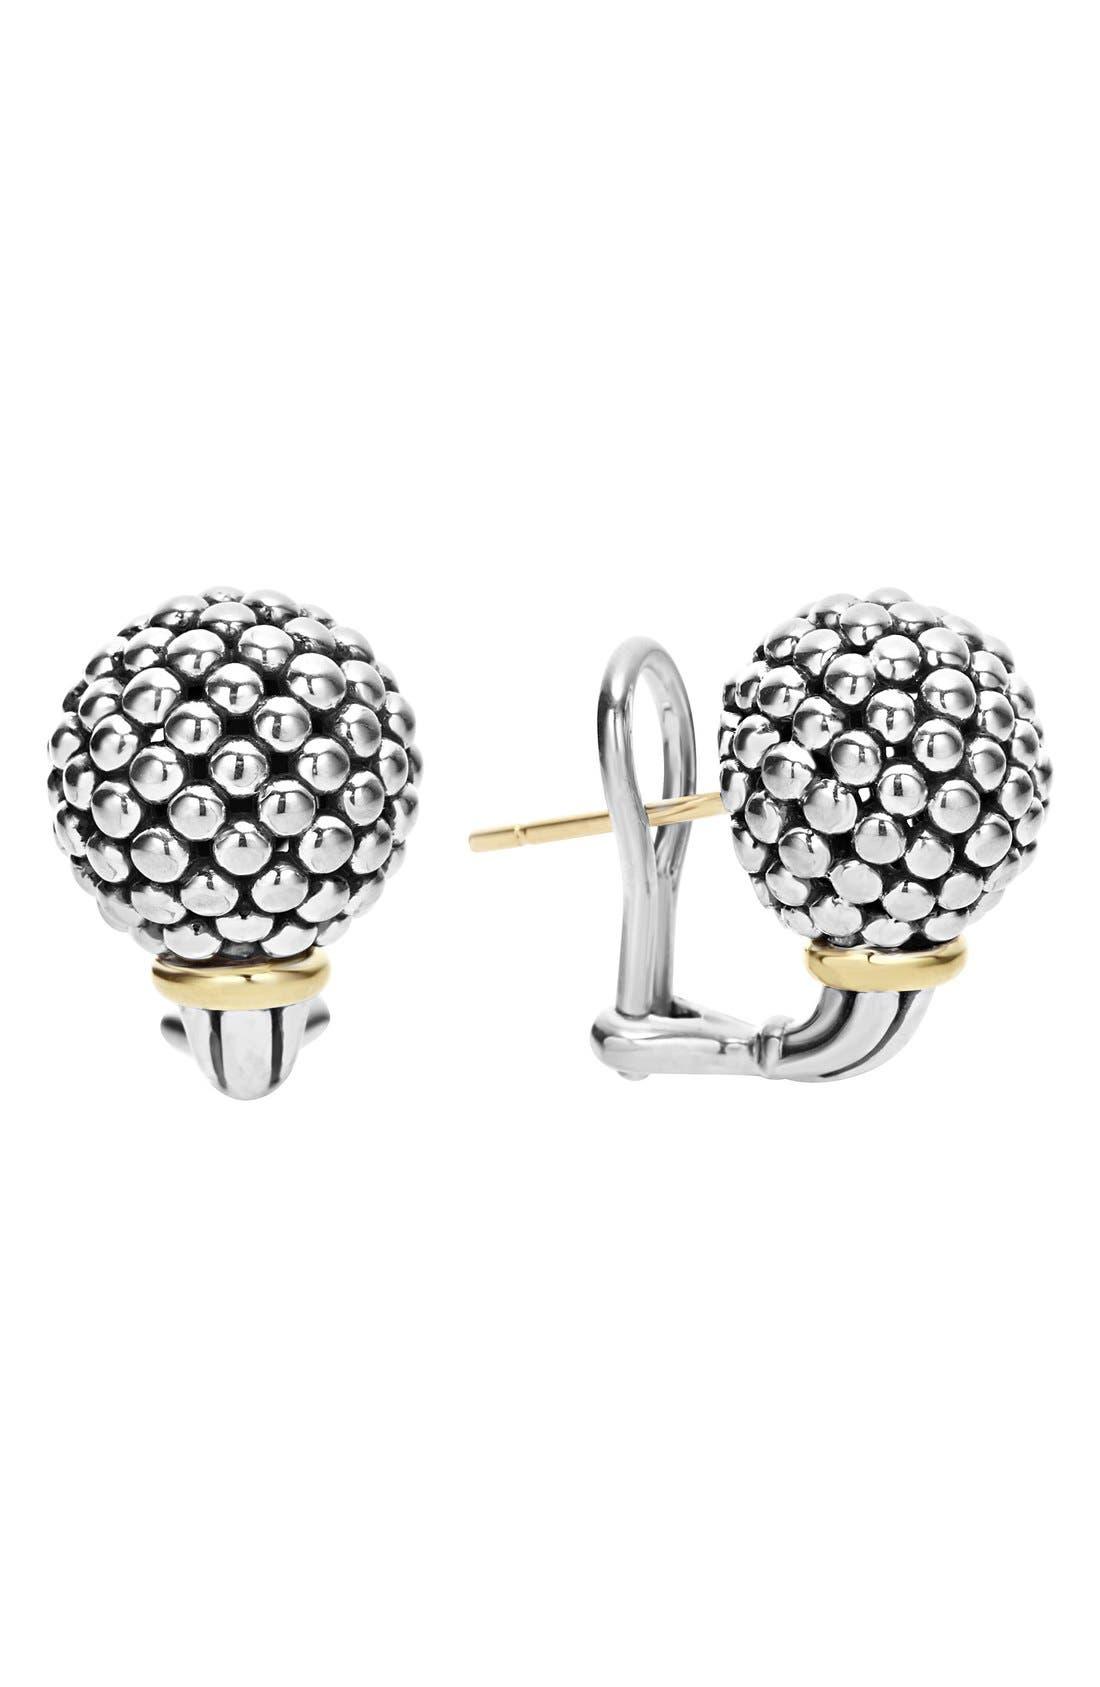 'Caviar Forever' Stud Earrings,                             Main thumbnail 1, color,                             040